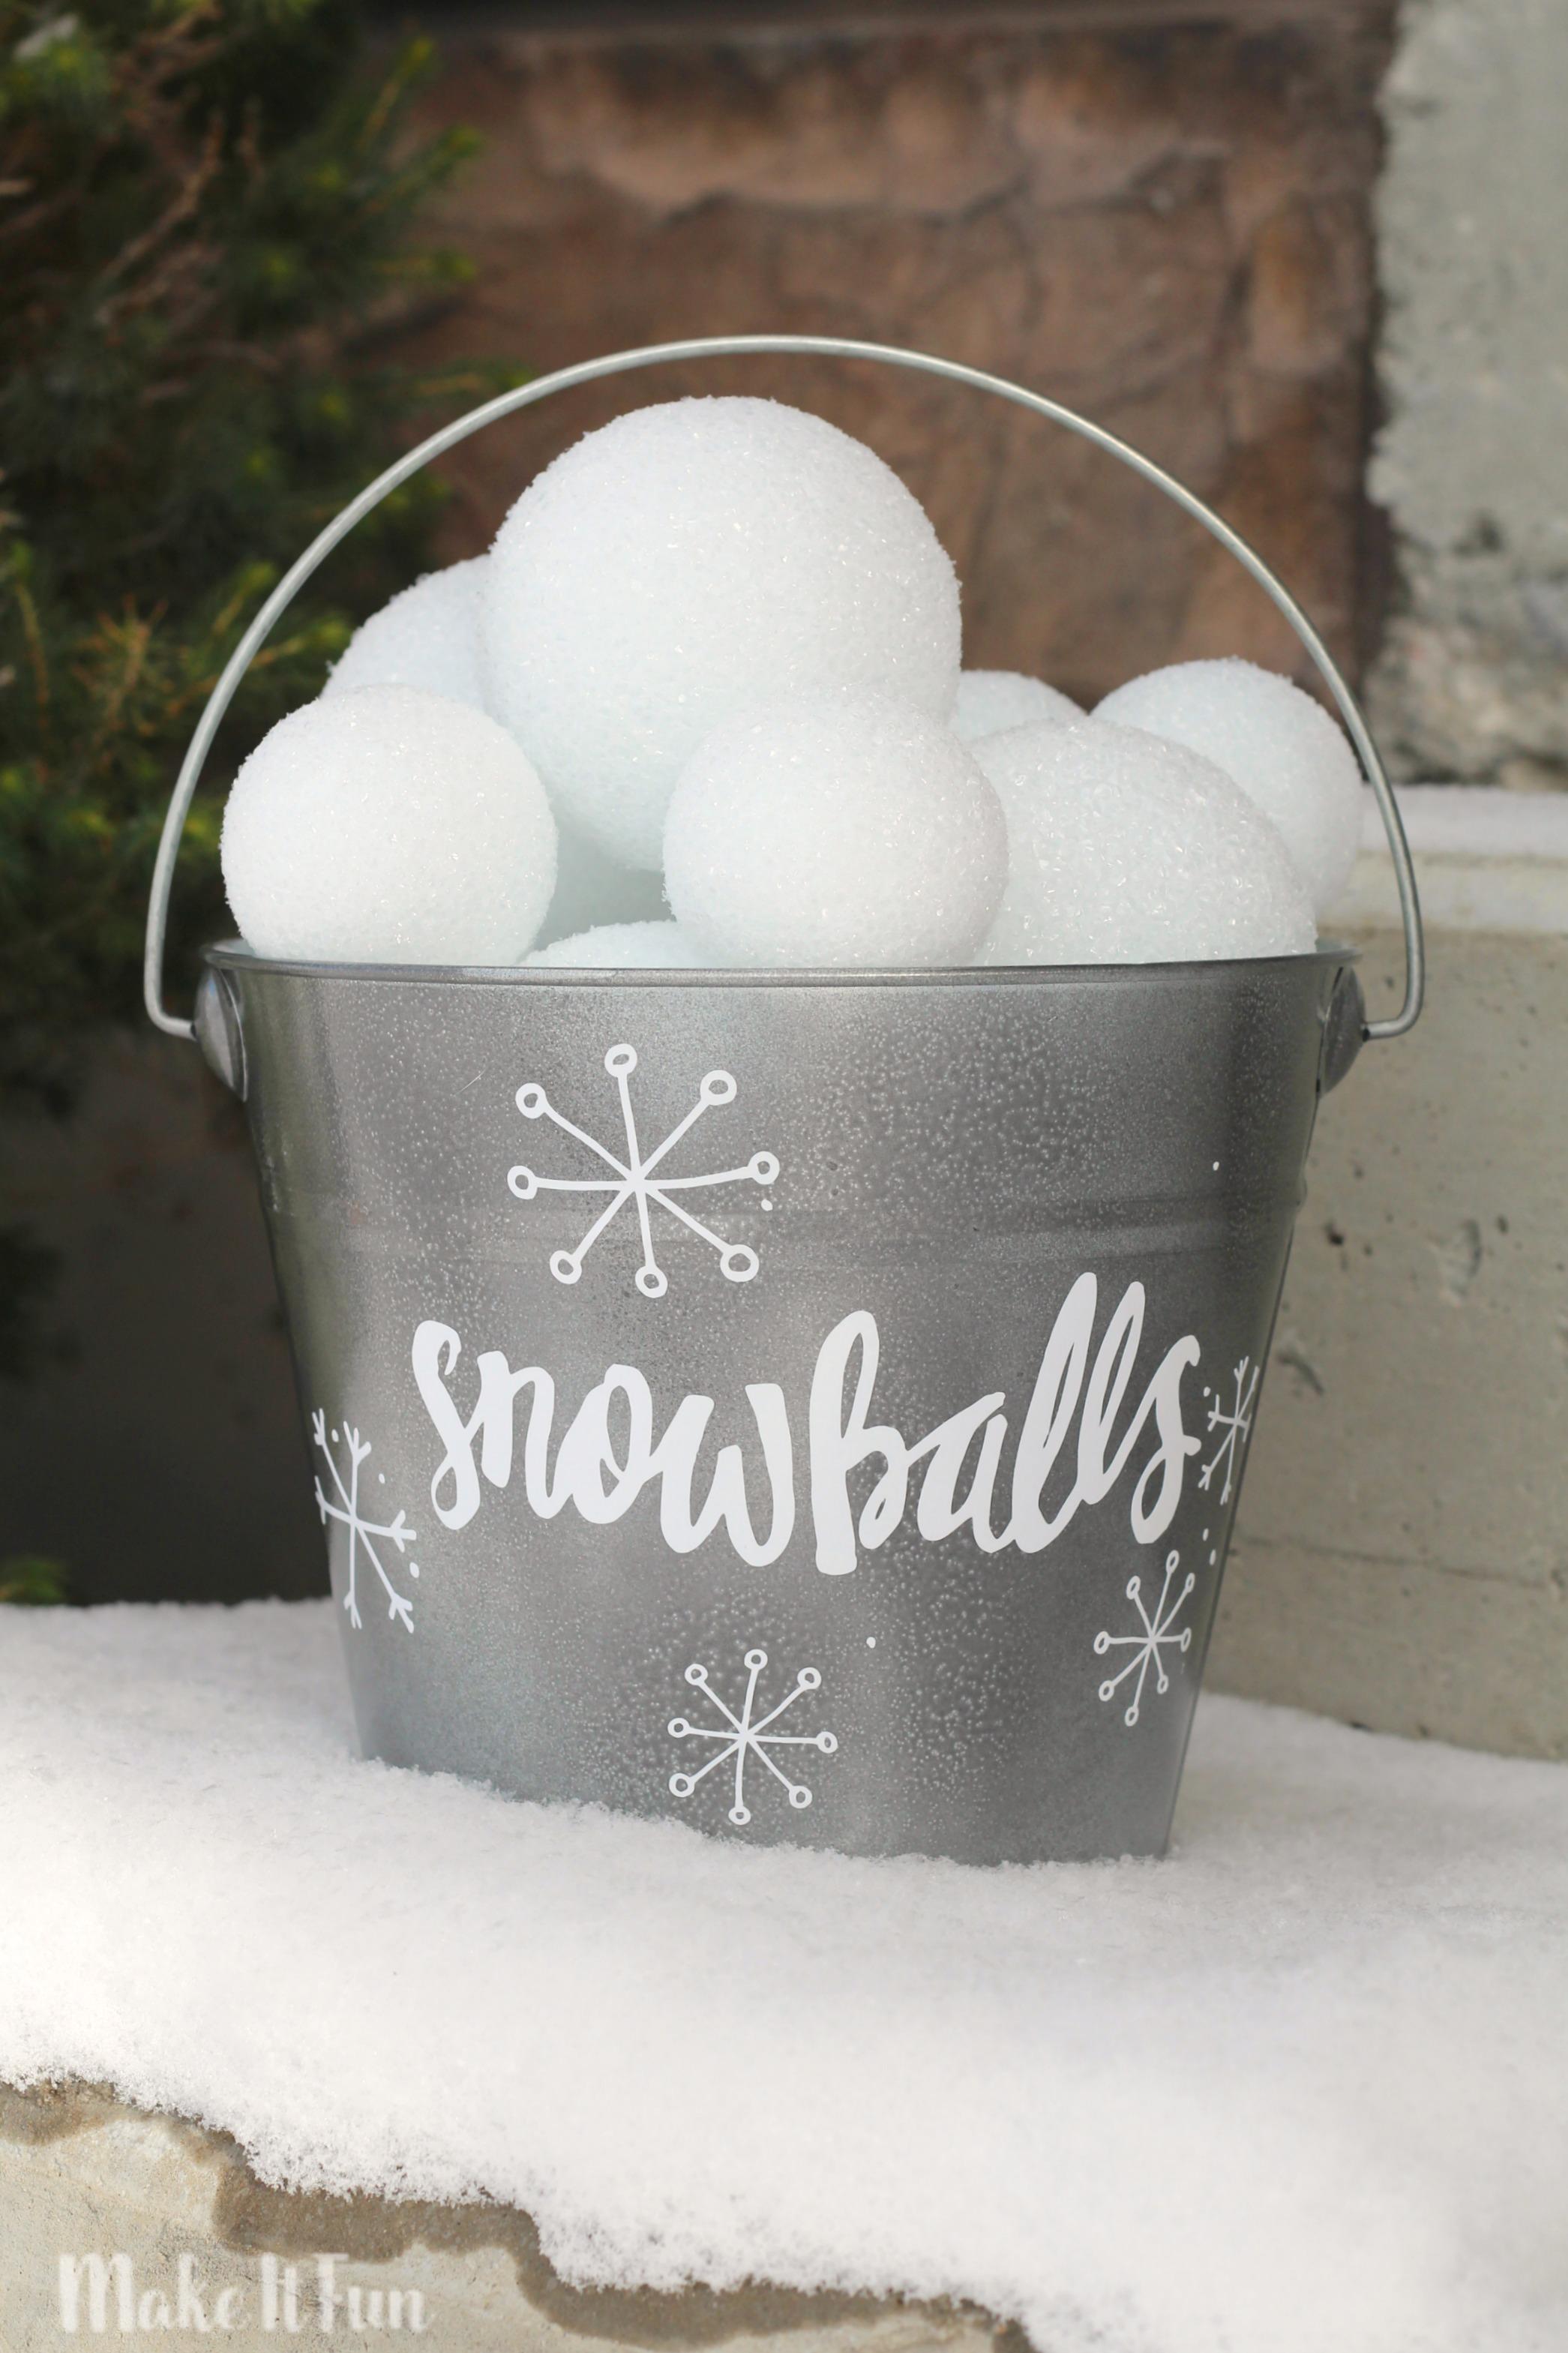 Buddy s Snowball Fight